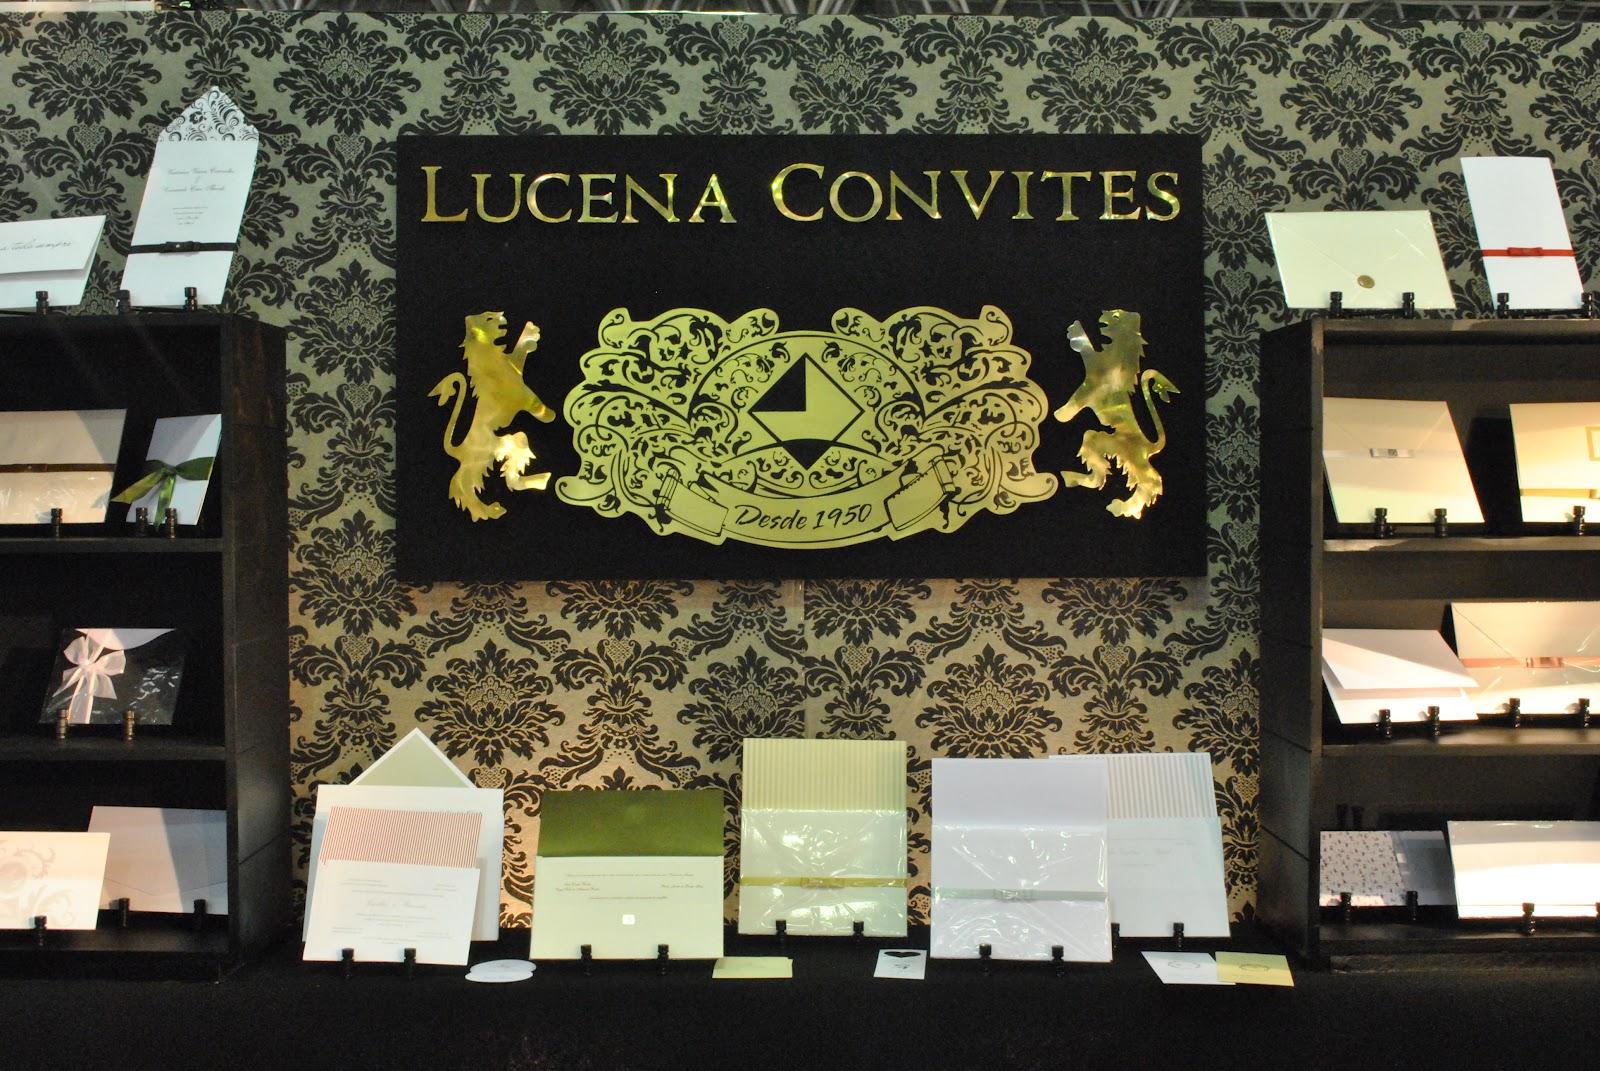 Expo Noivas Stands : Atelier andrea figueiredo stand lucena convites expo